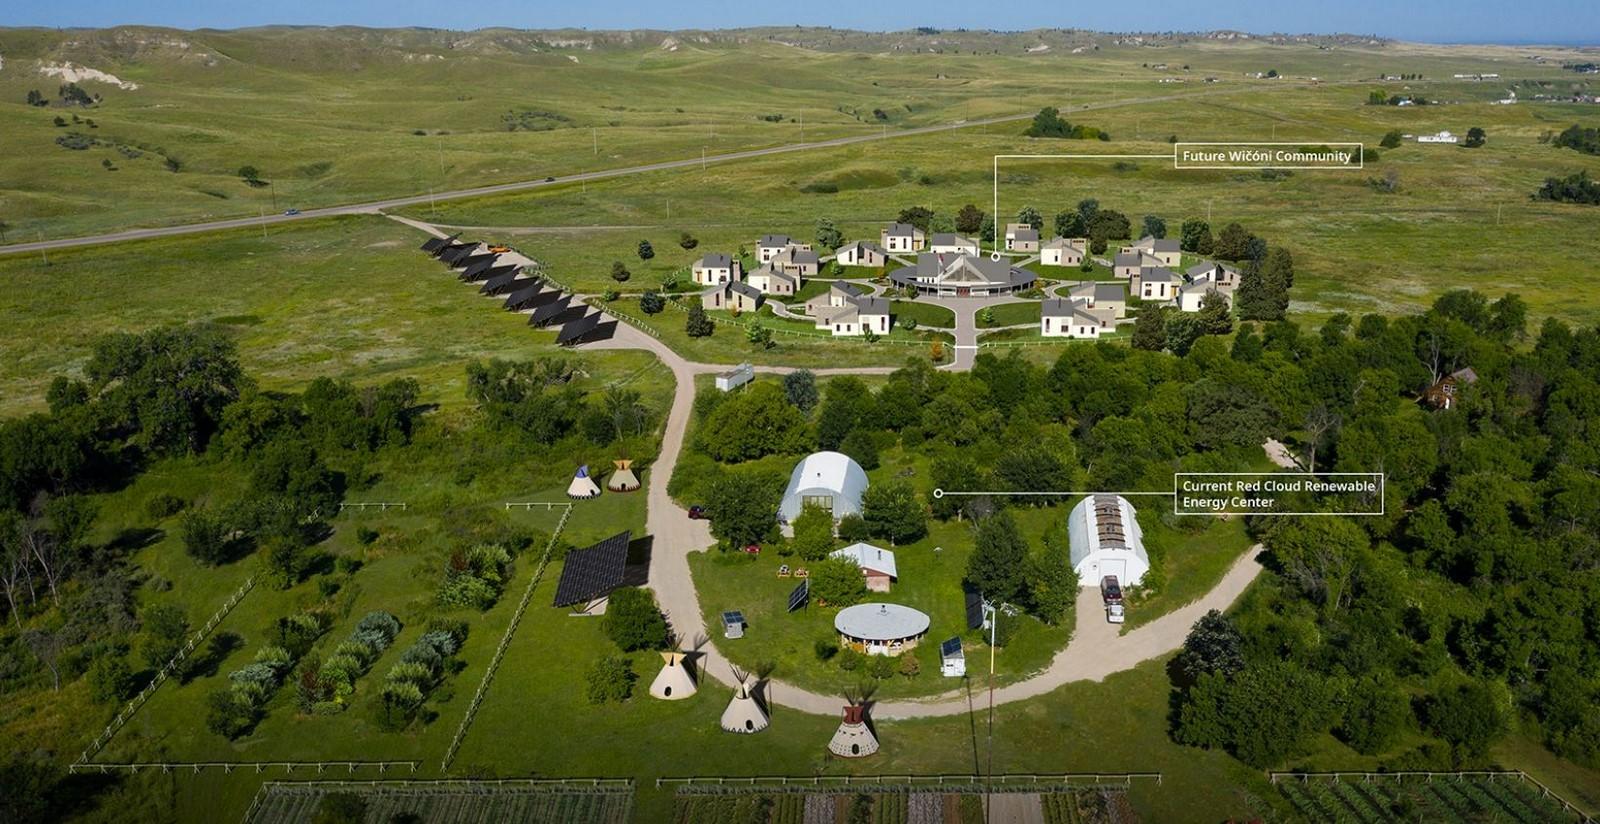 Wiconi Community - Pine Ridge, South Dakota - Sheet1